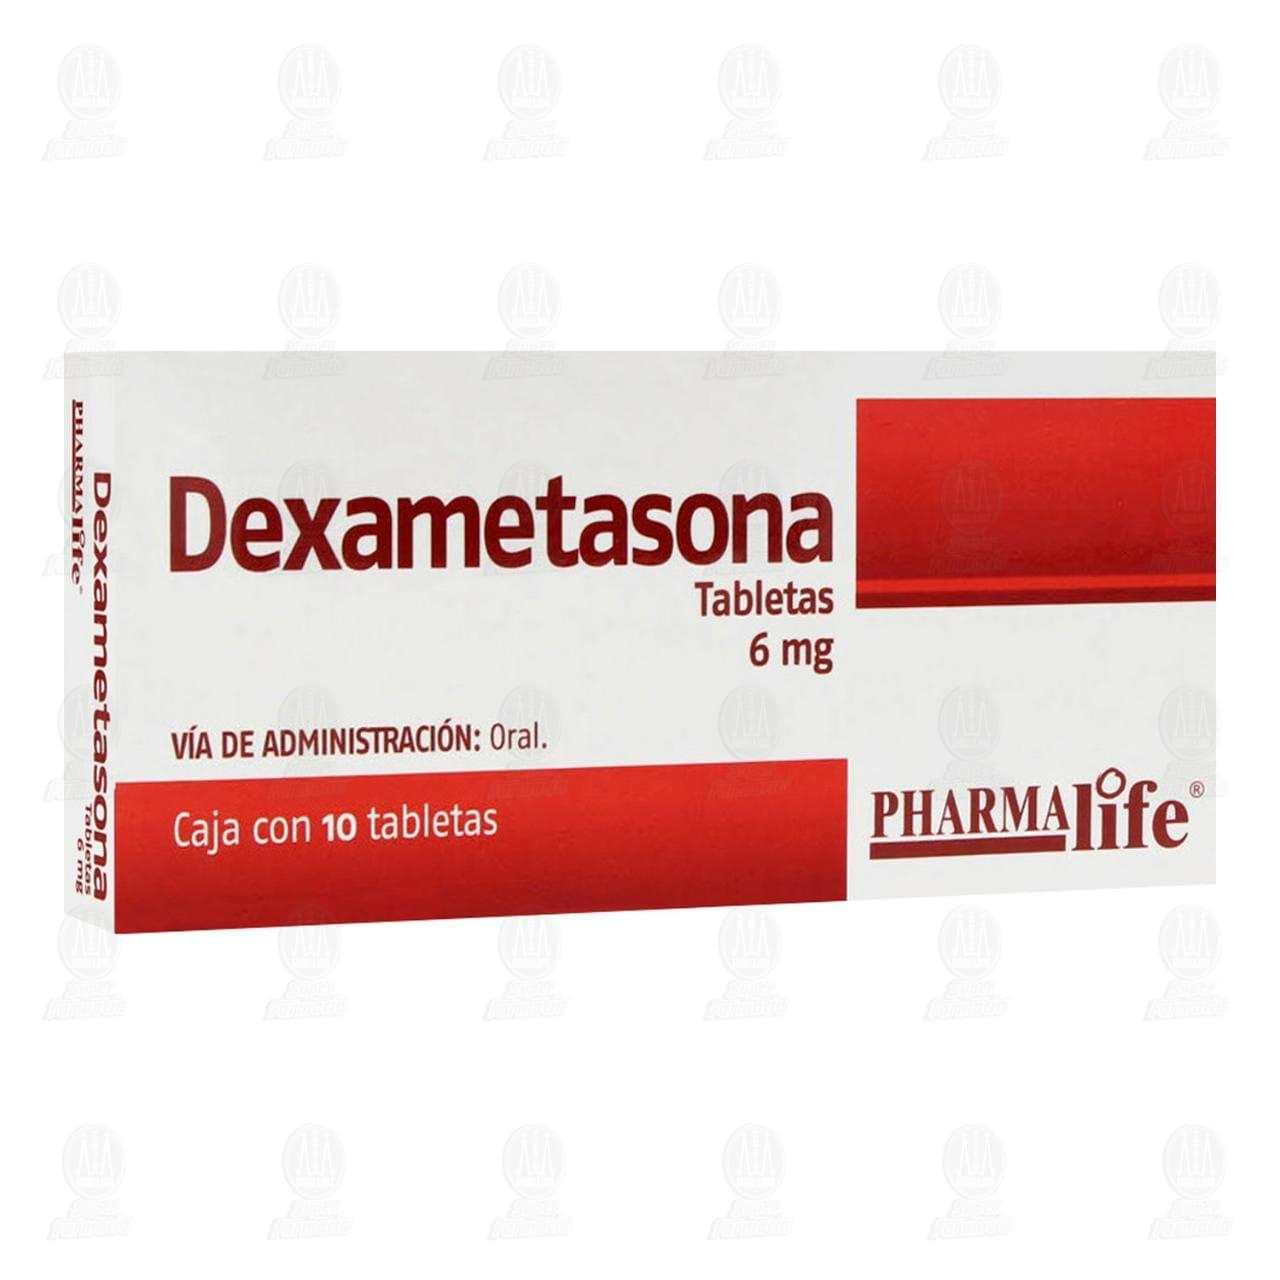 Comprar Dexametasona 6mg 10 Tabletas Pharmalife en Farmacias Guadalajara